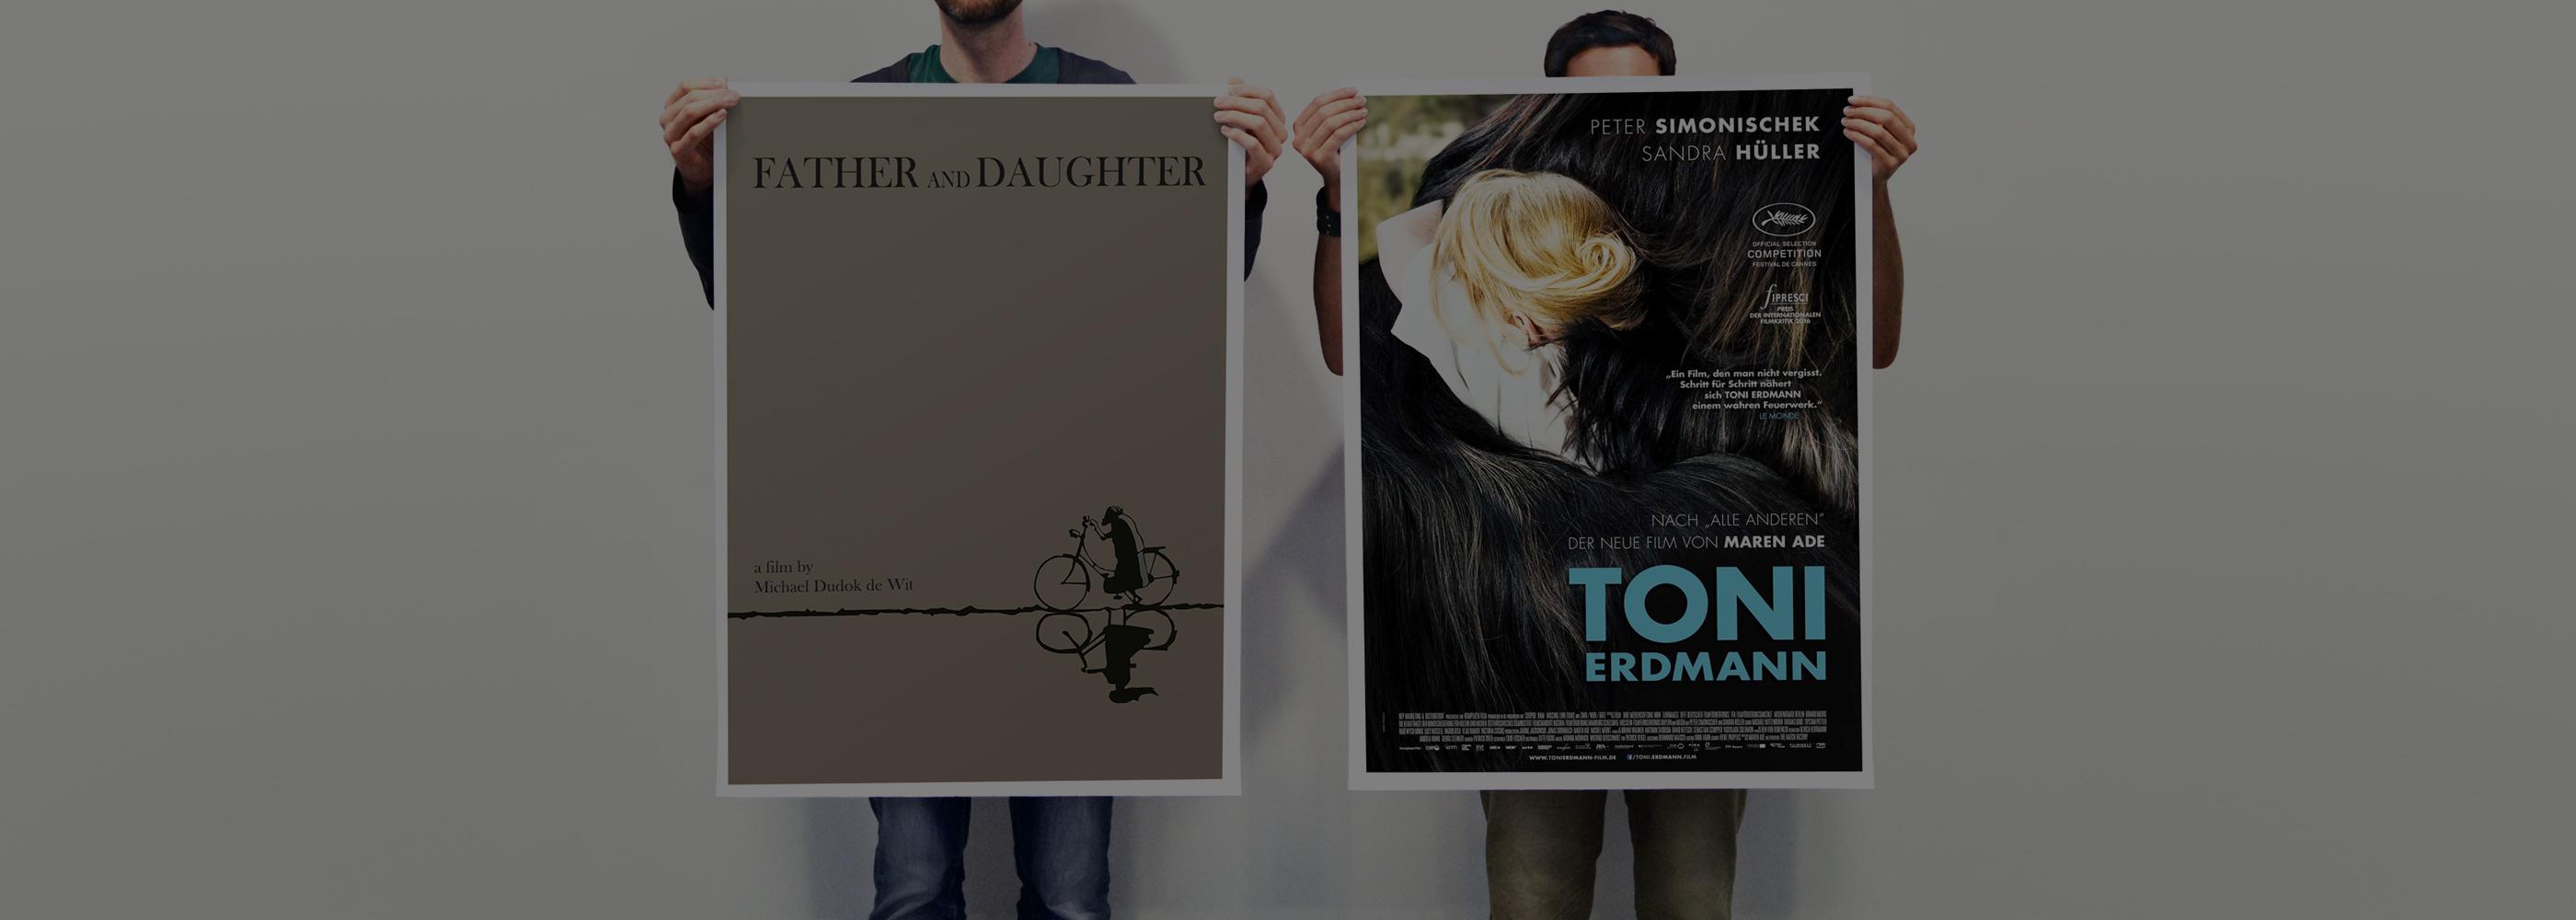 grasundsterne blog film feierabend content marketing